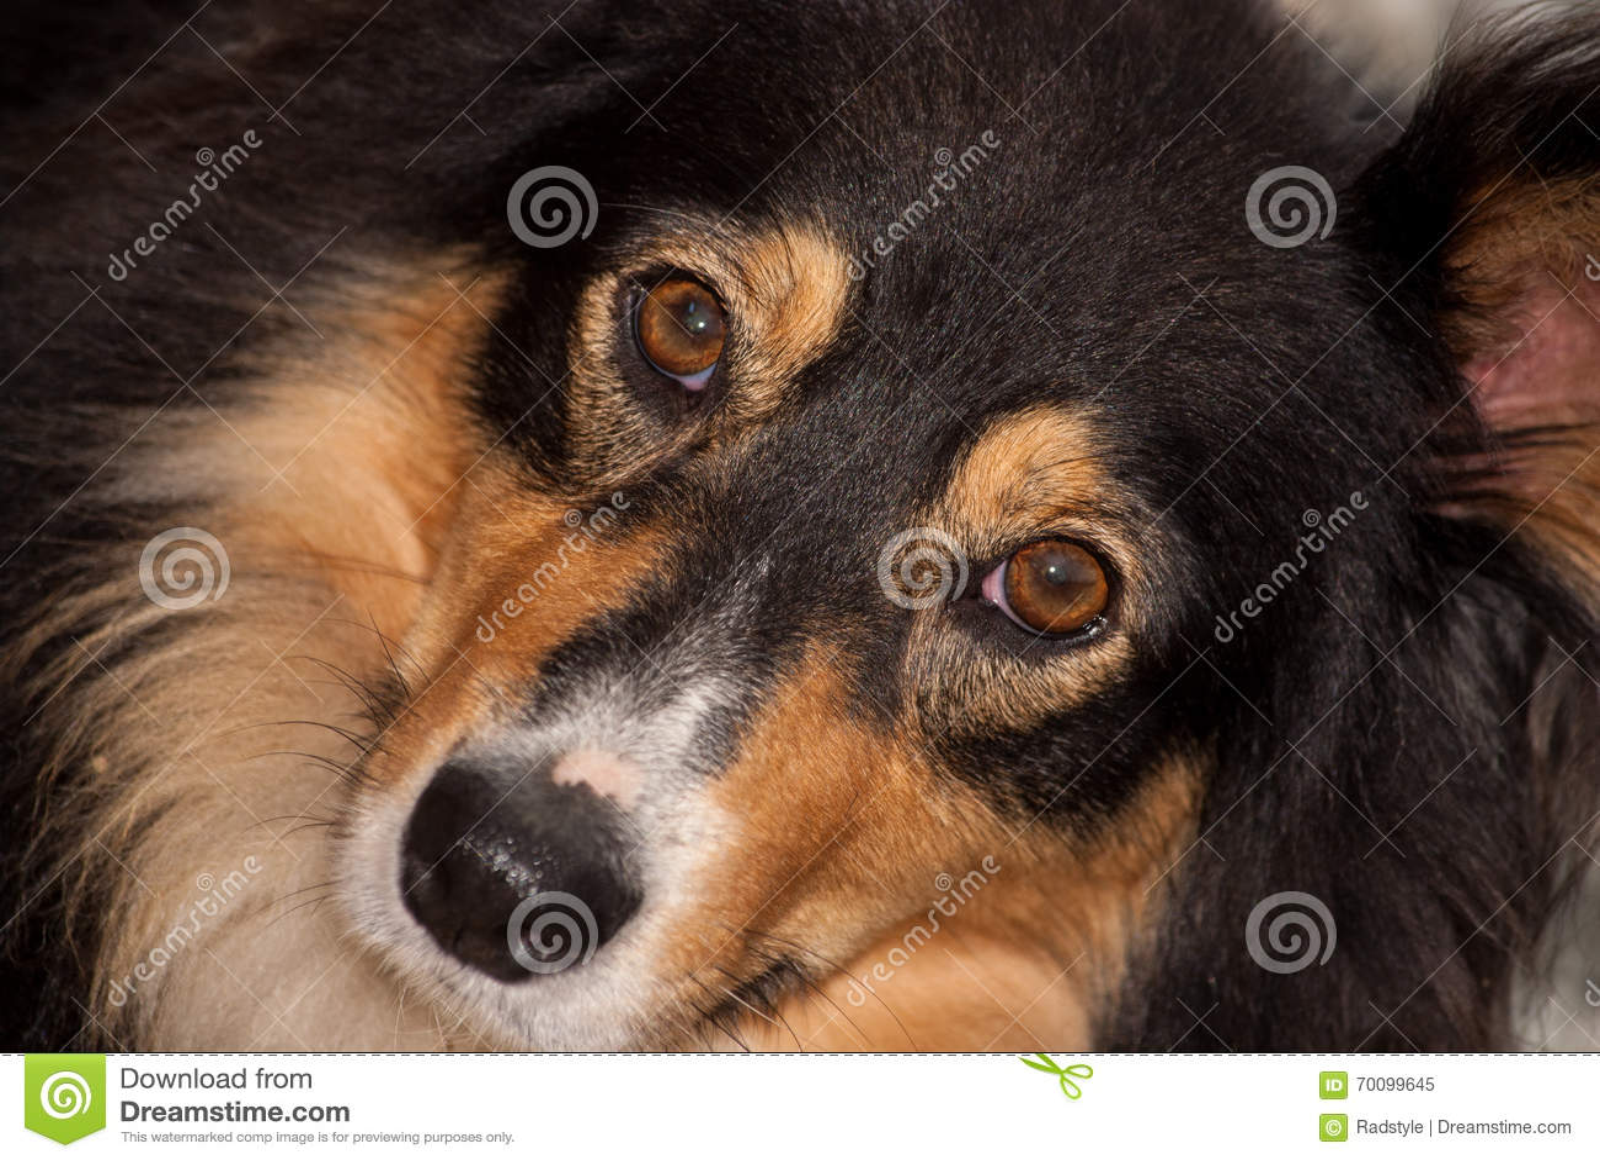 Saluki Cross Breed Full Frame Face Stock Image - Image of